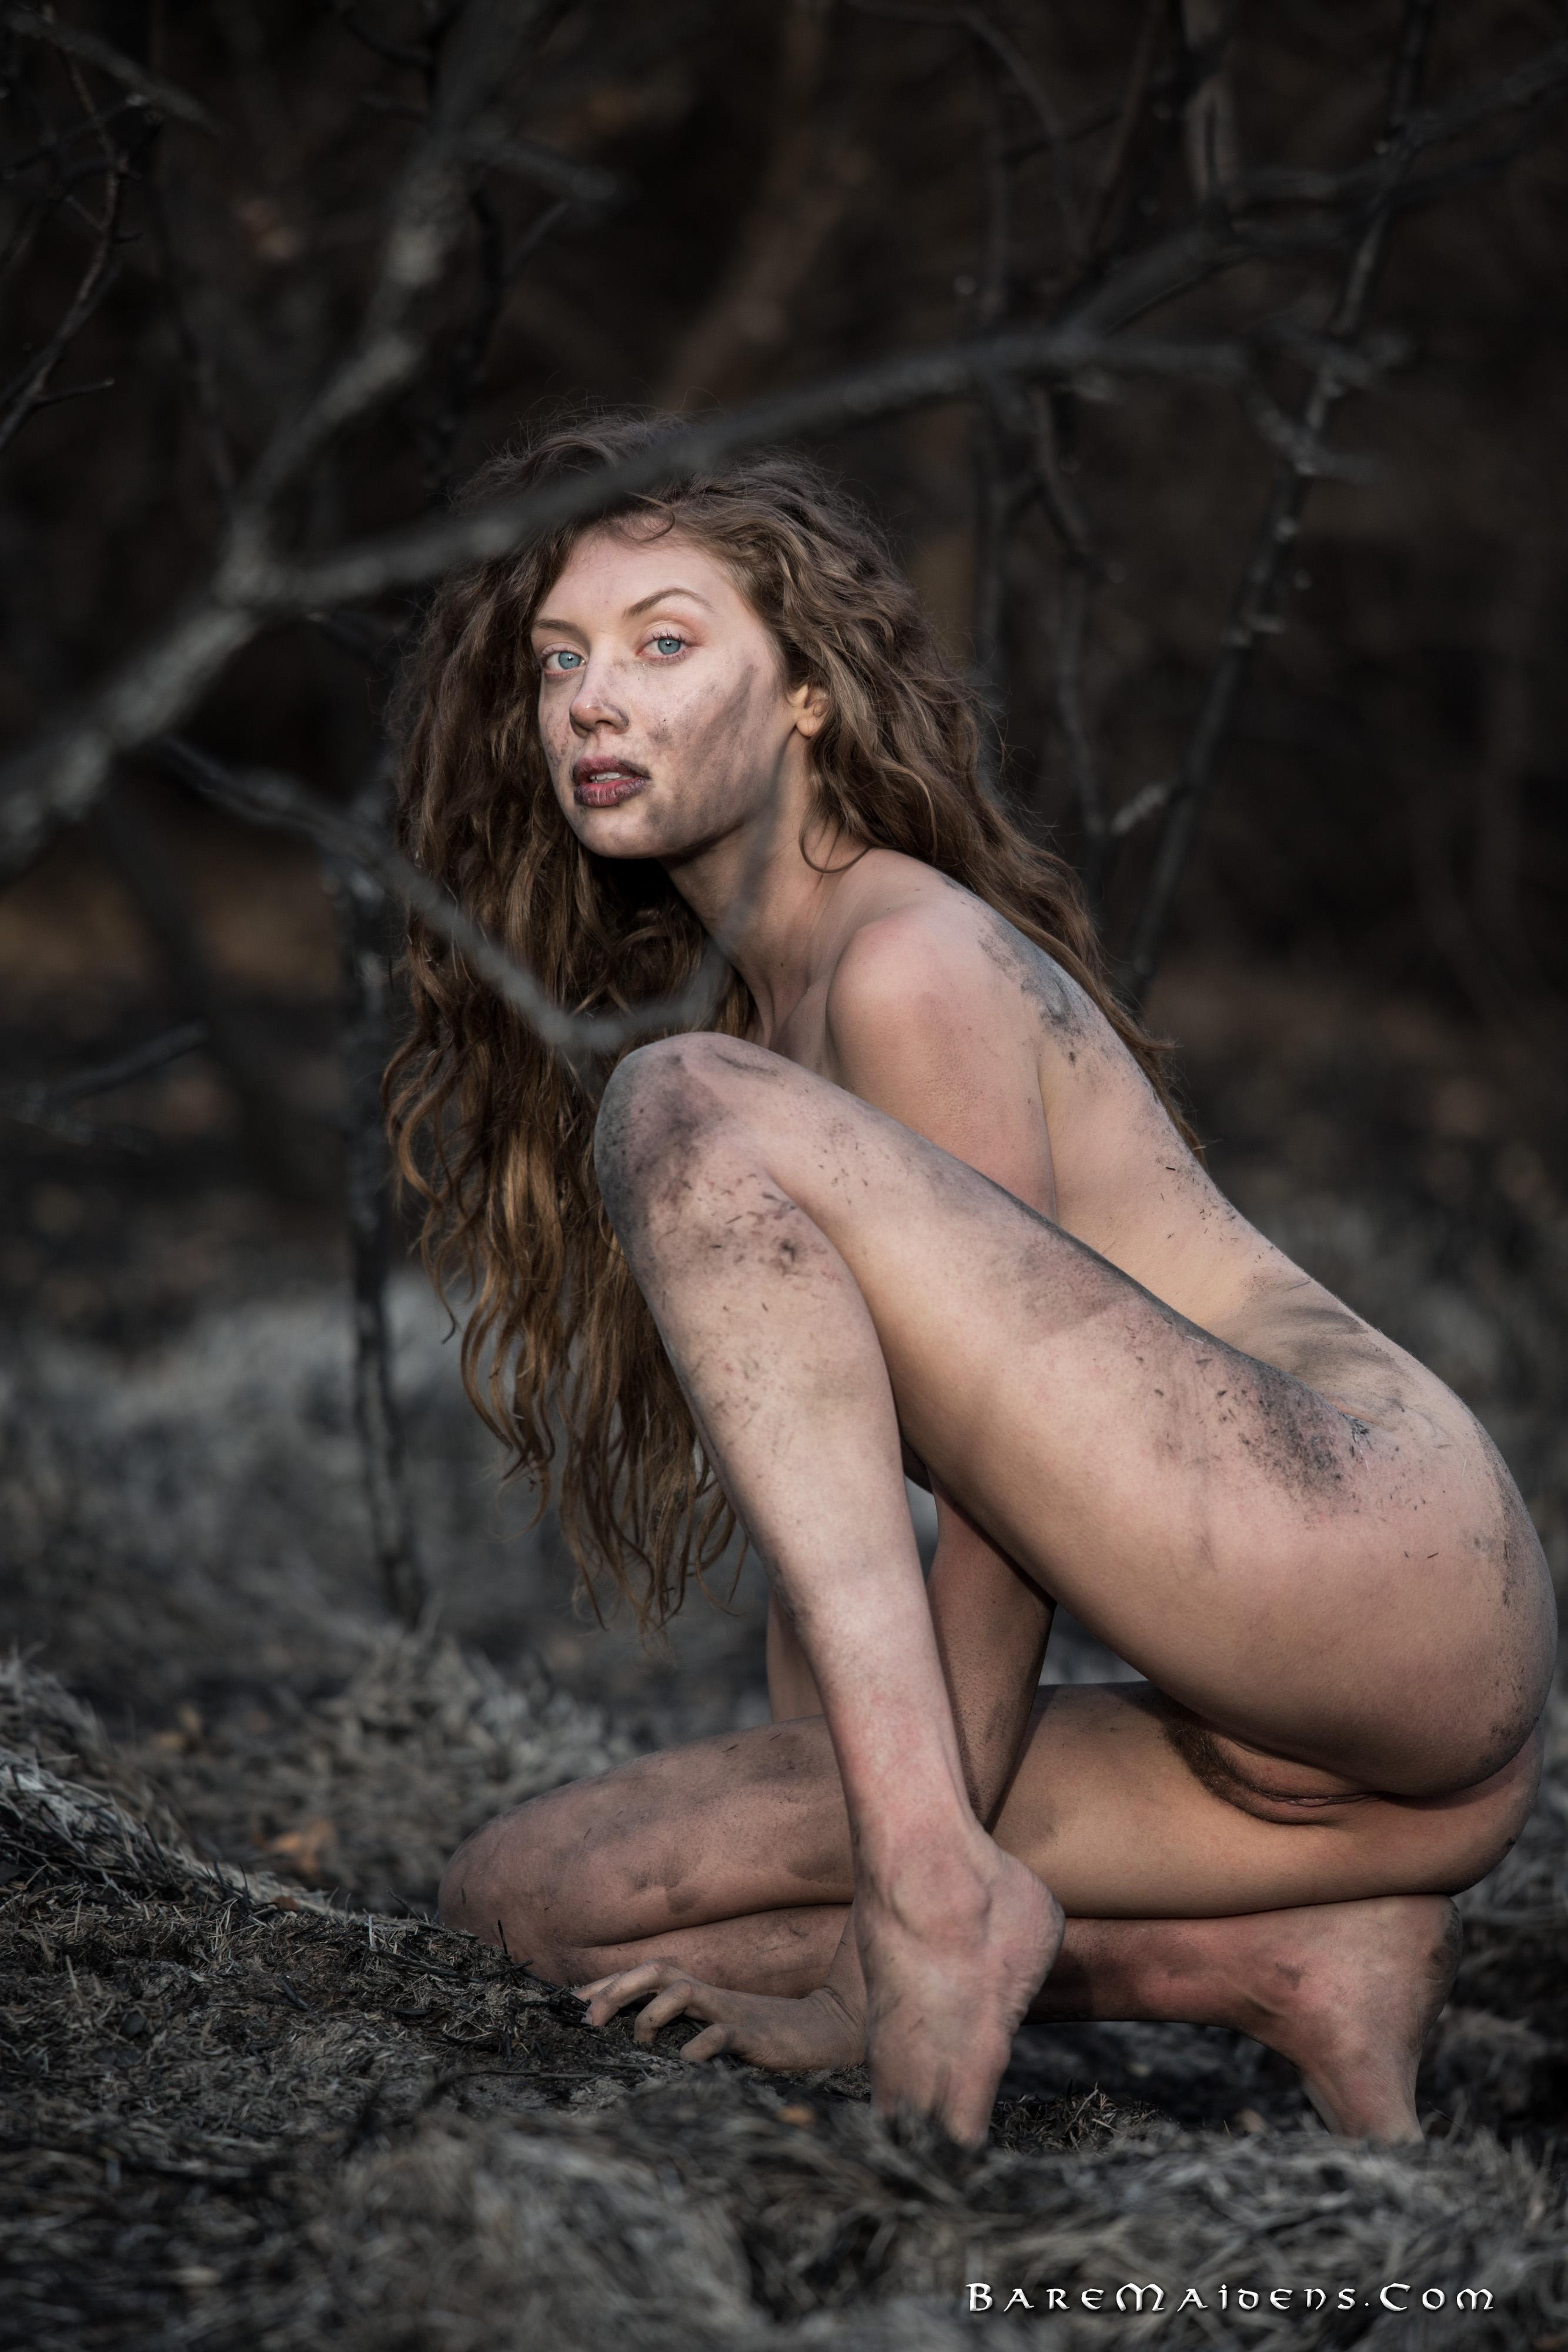 brazil nude girl model